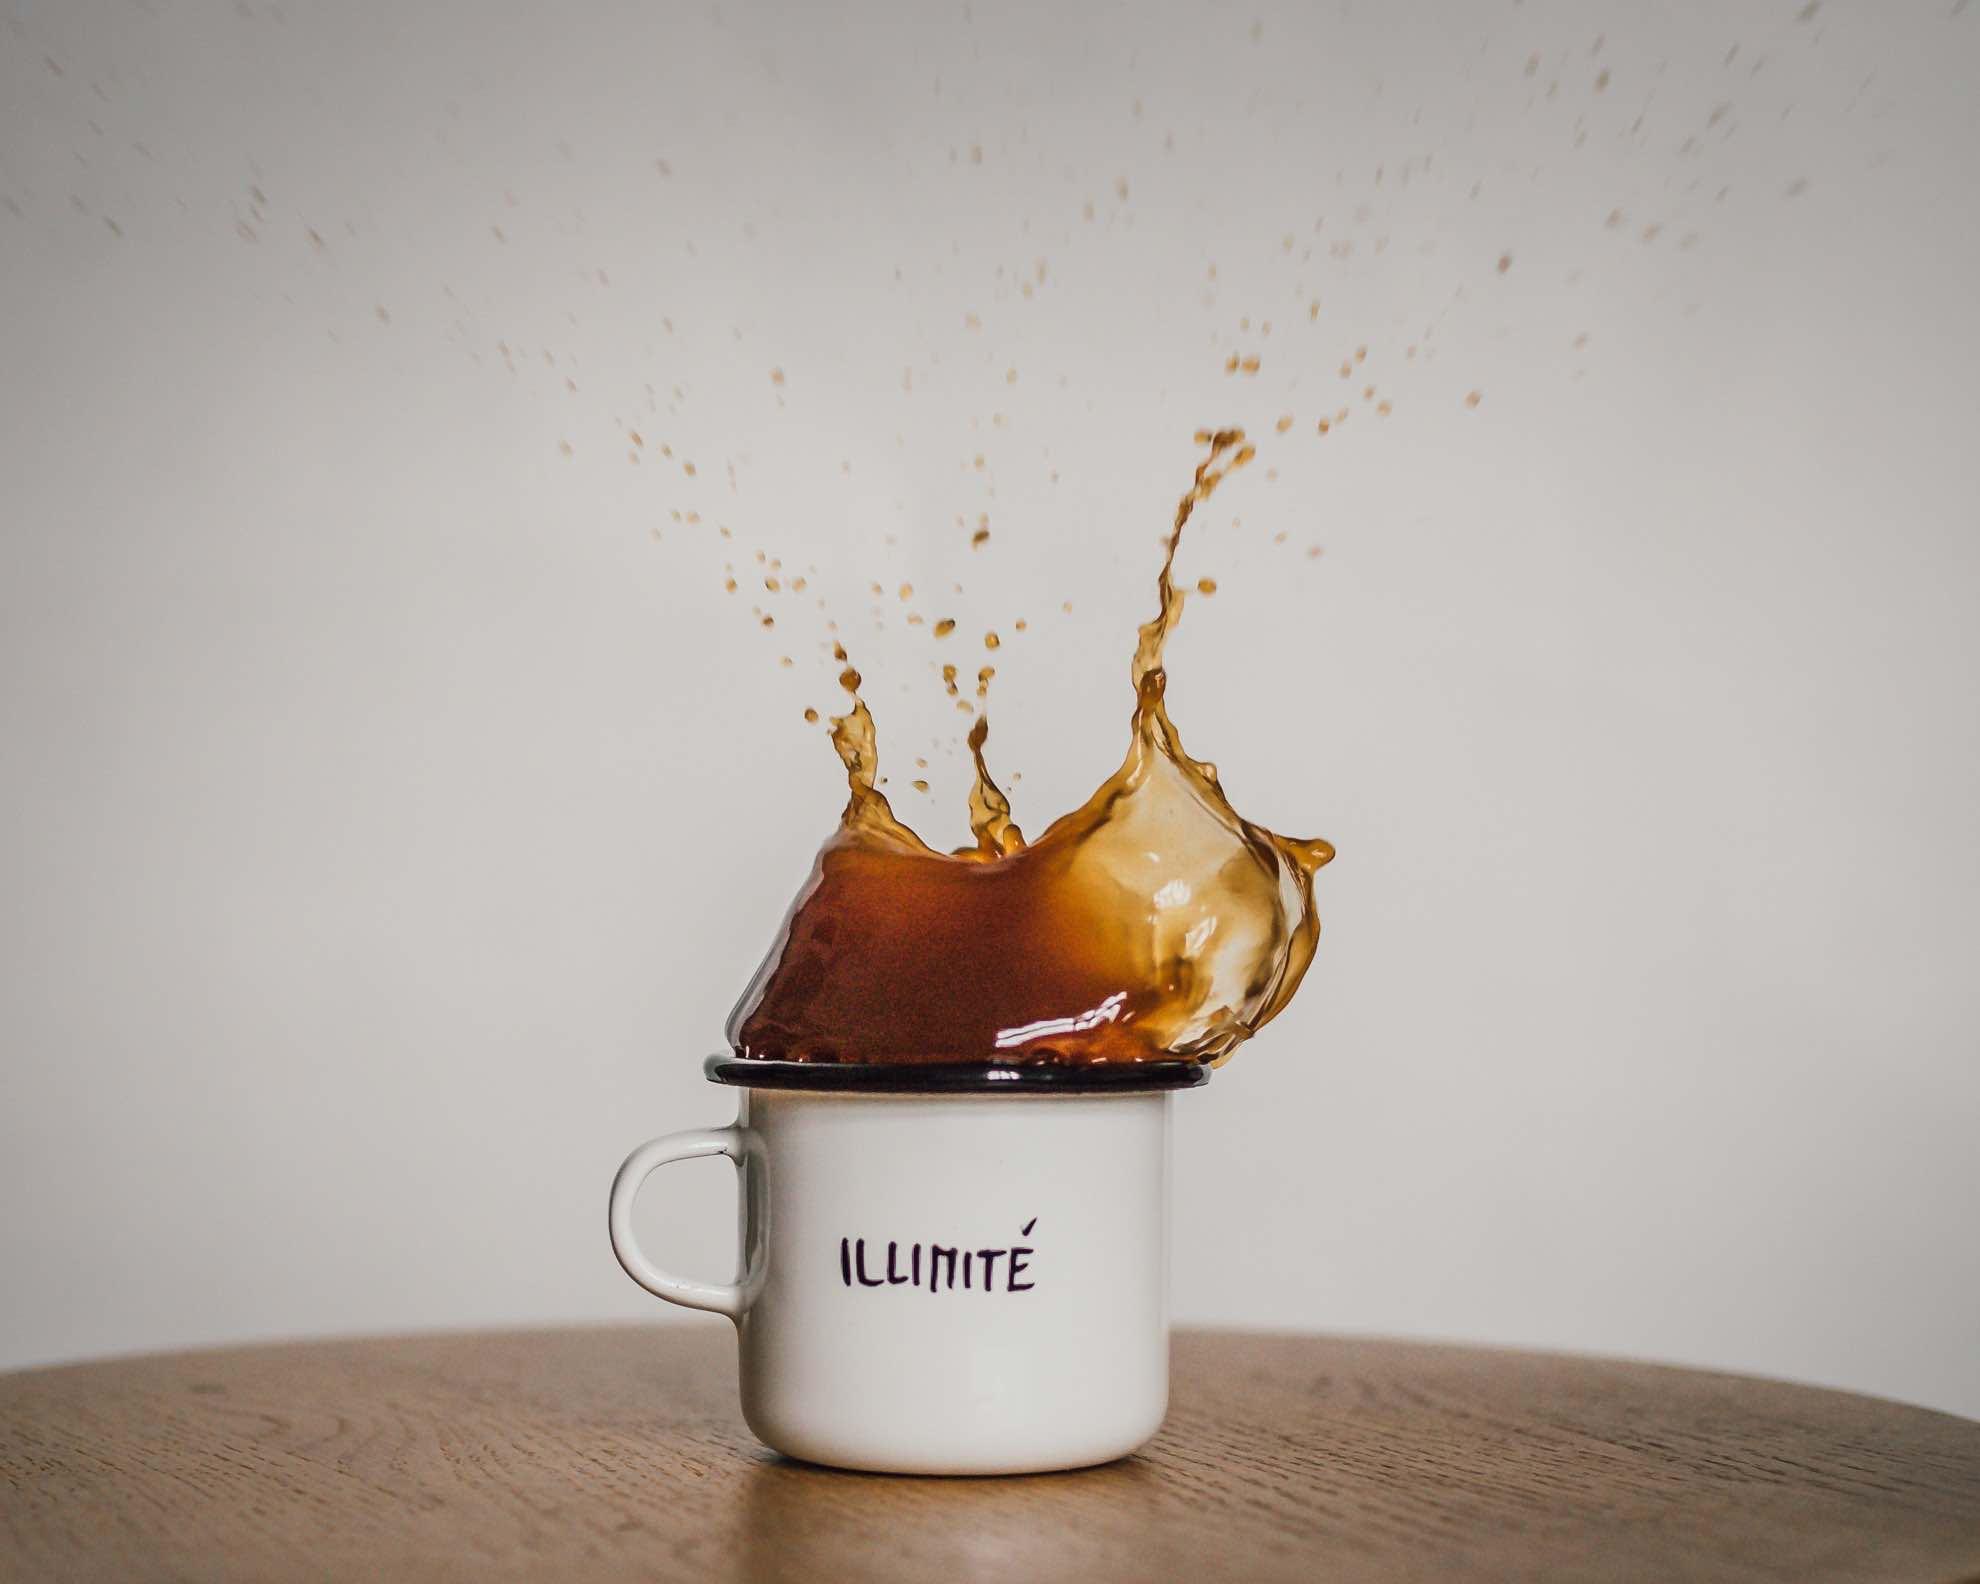 ILLIMITE SPECIALTY COFFEÉ